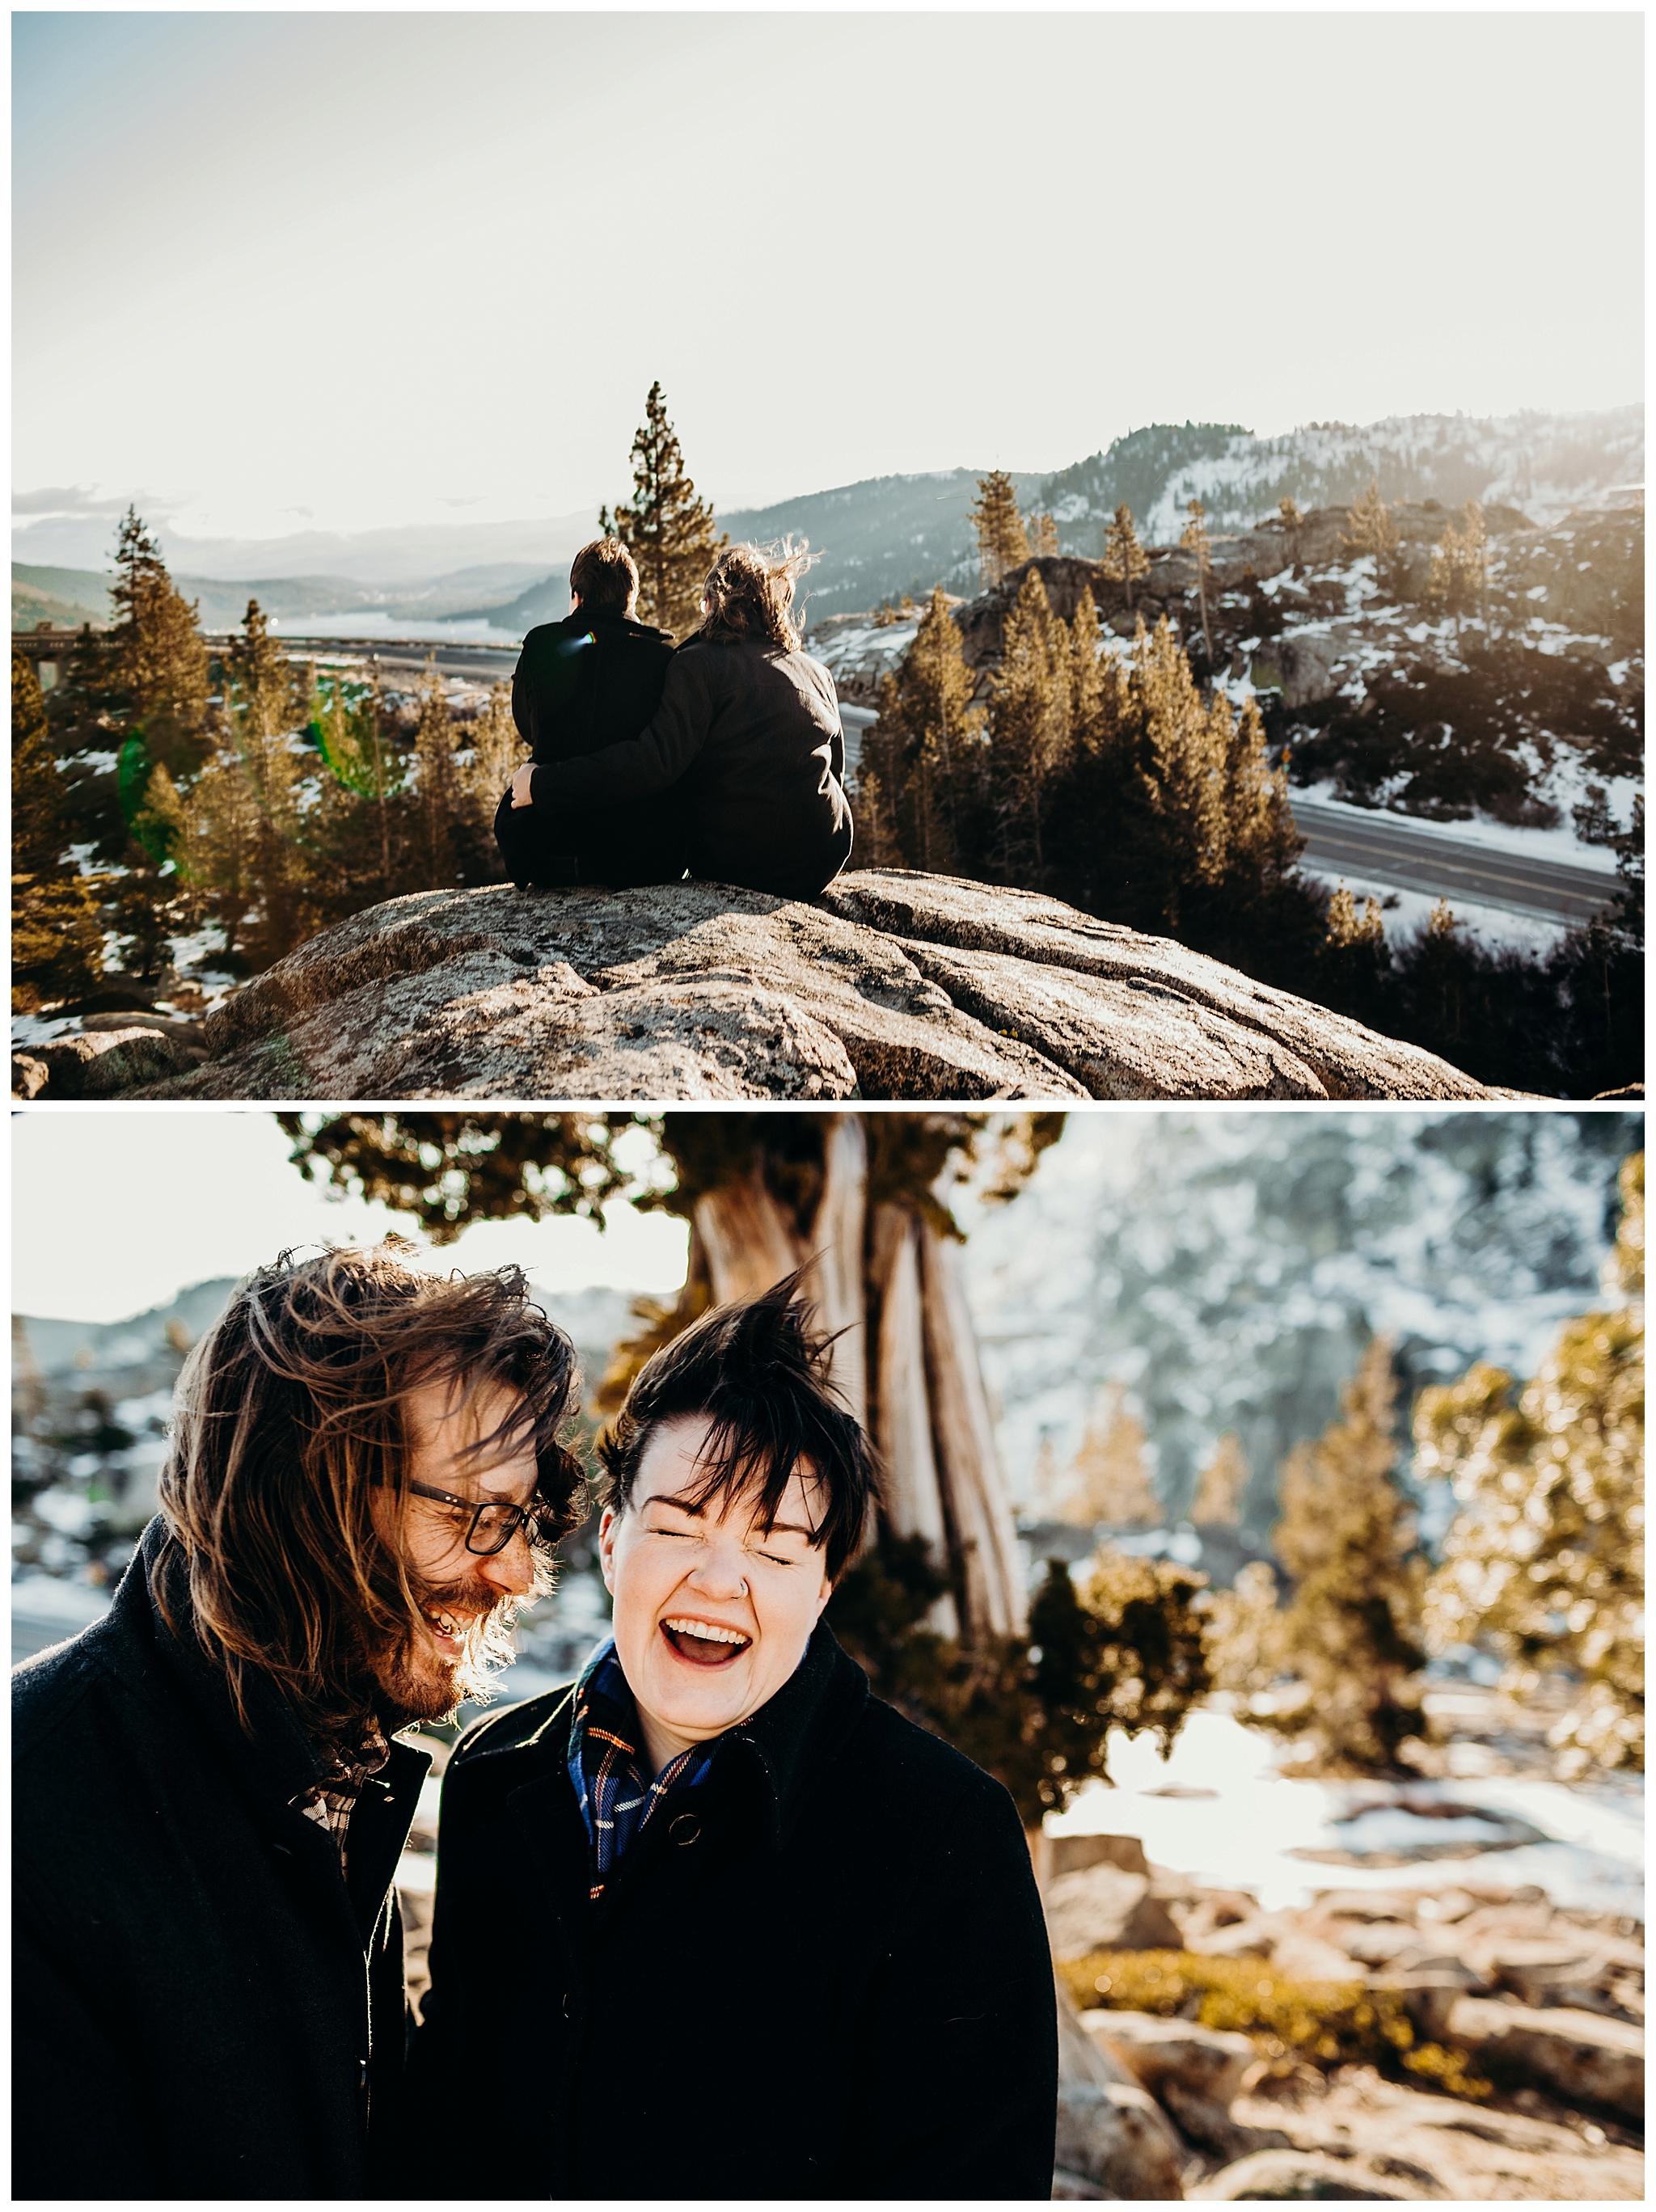 reno-tahoe-truckee-lifestyle-engagement-elopemet-wedding-photographer-2.jpg